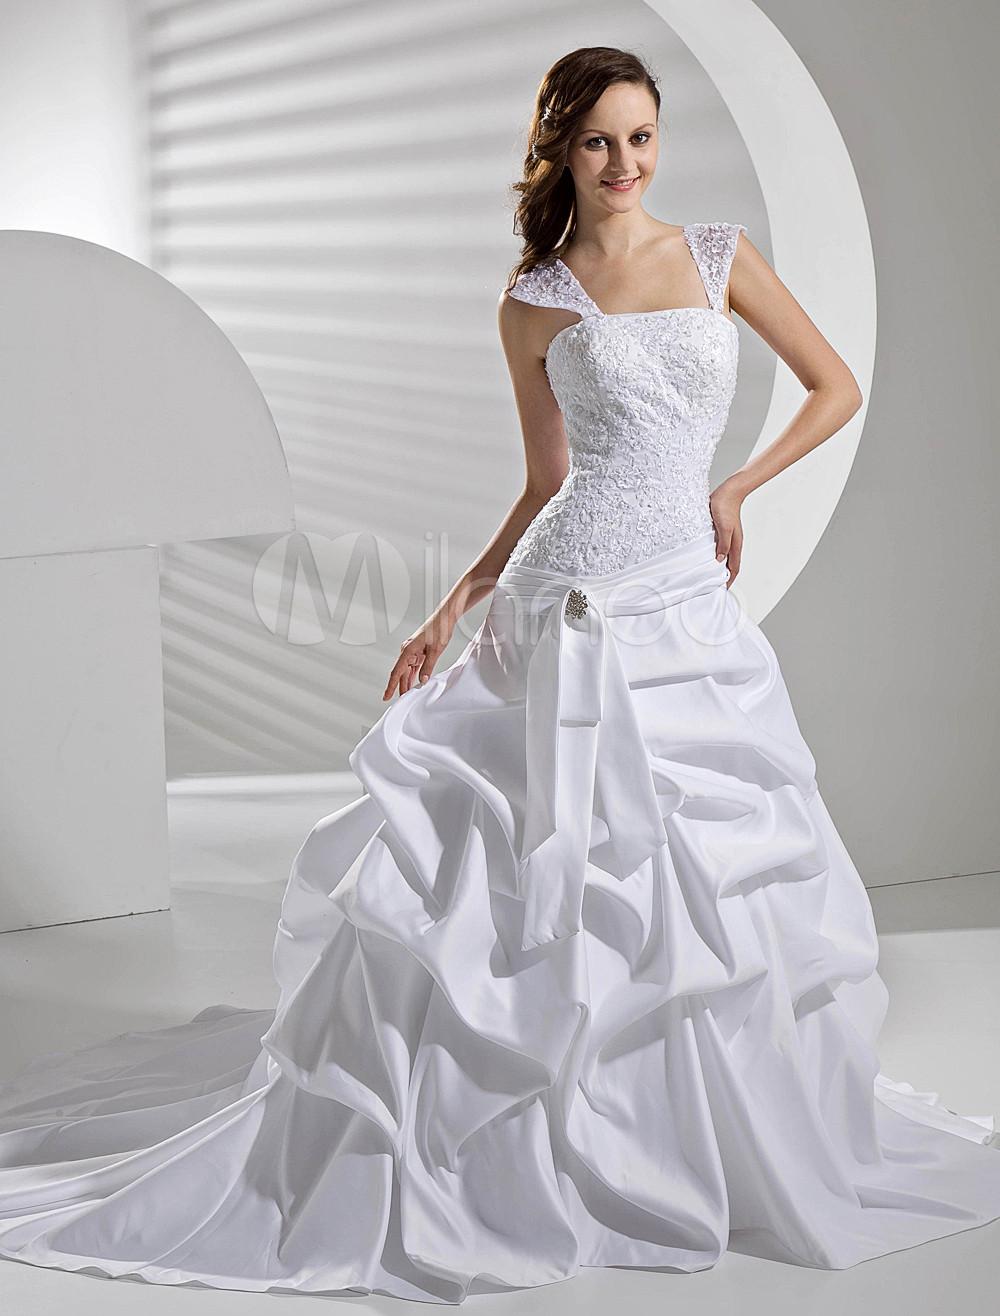 42f6b4edb95 2019 Wedding Dress Princess Ball Gown Straps Lace Up Satin Draped Beading  Bridal Dress - Milanoo.com